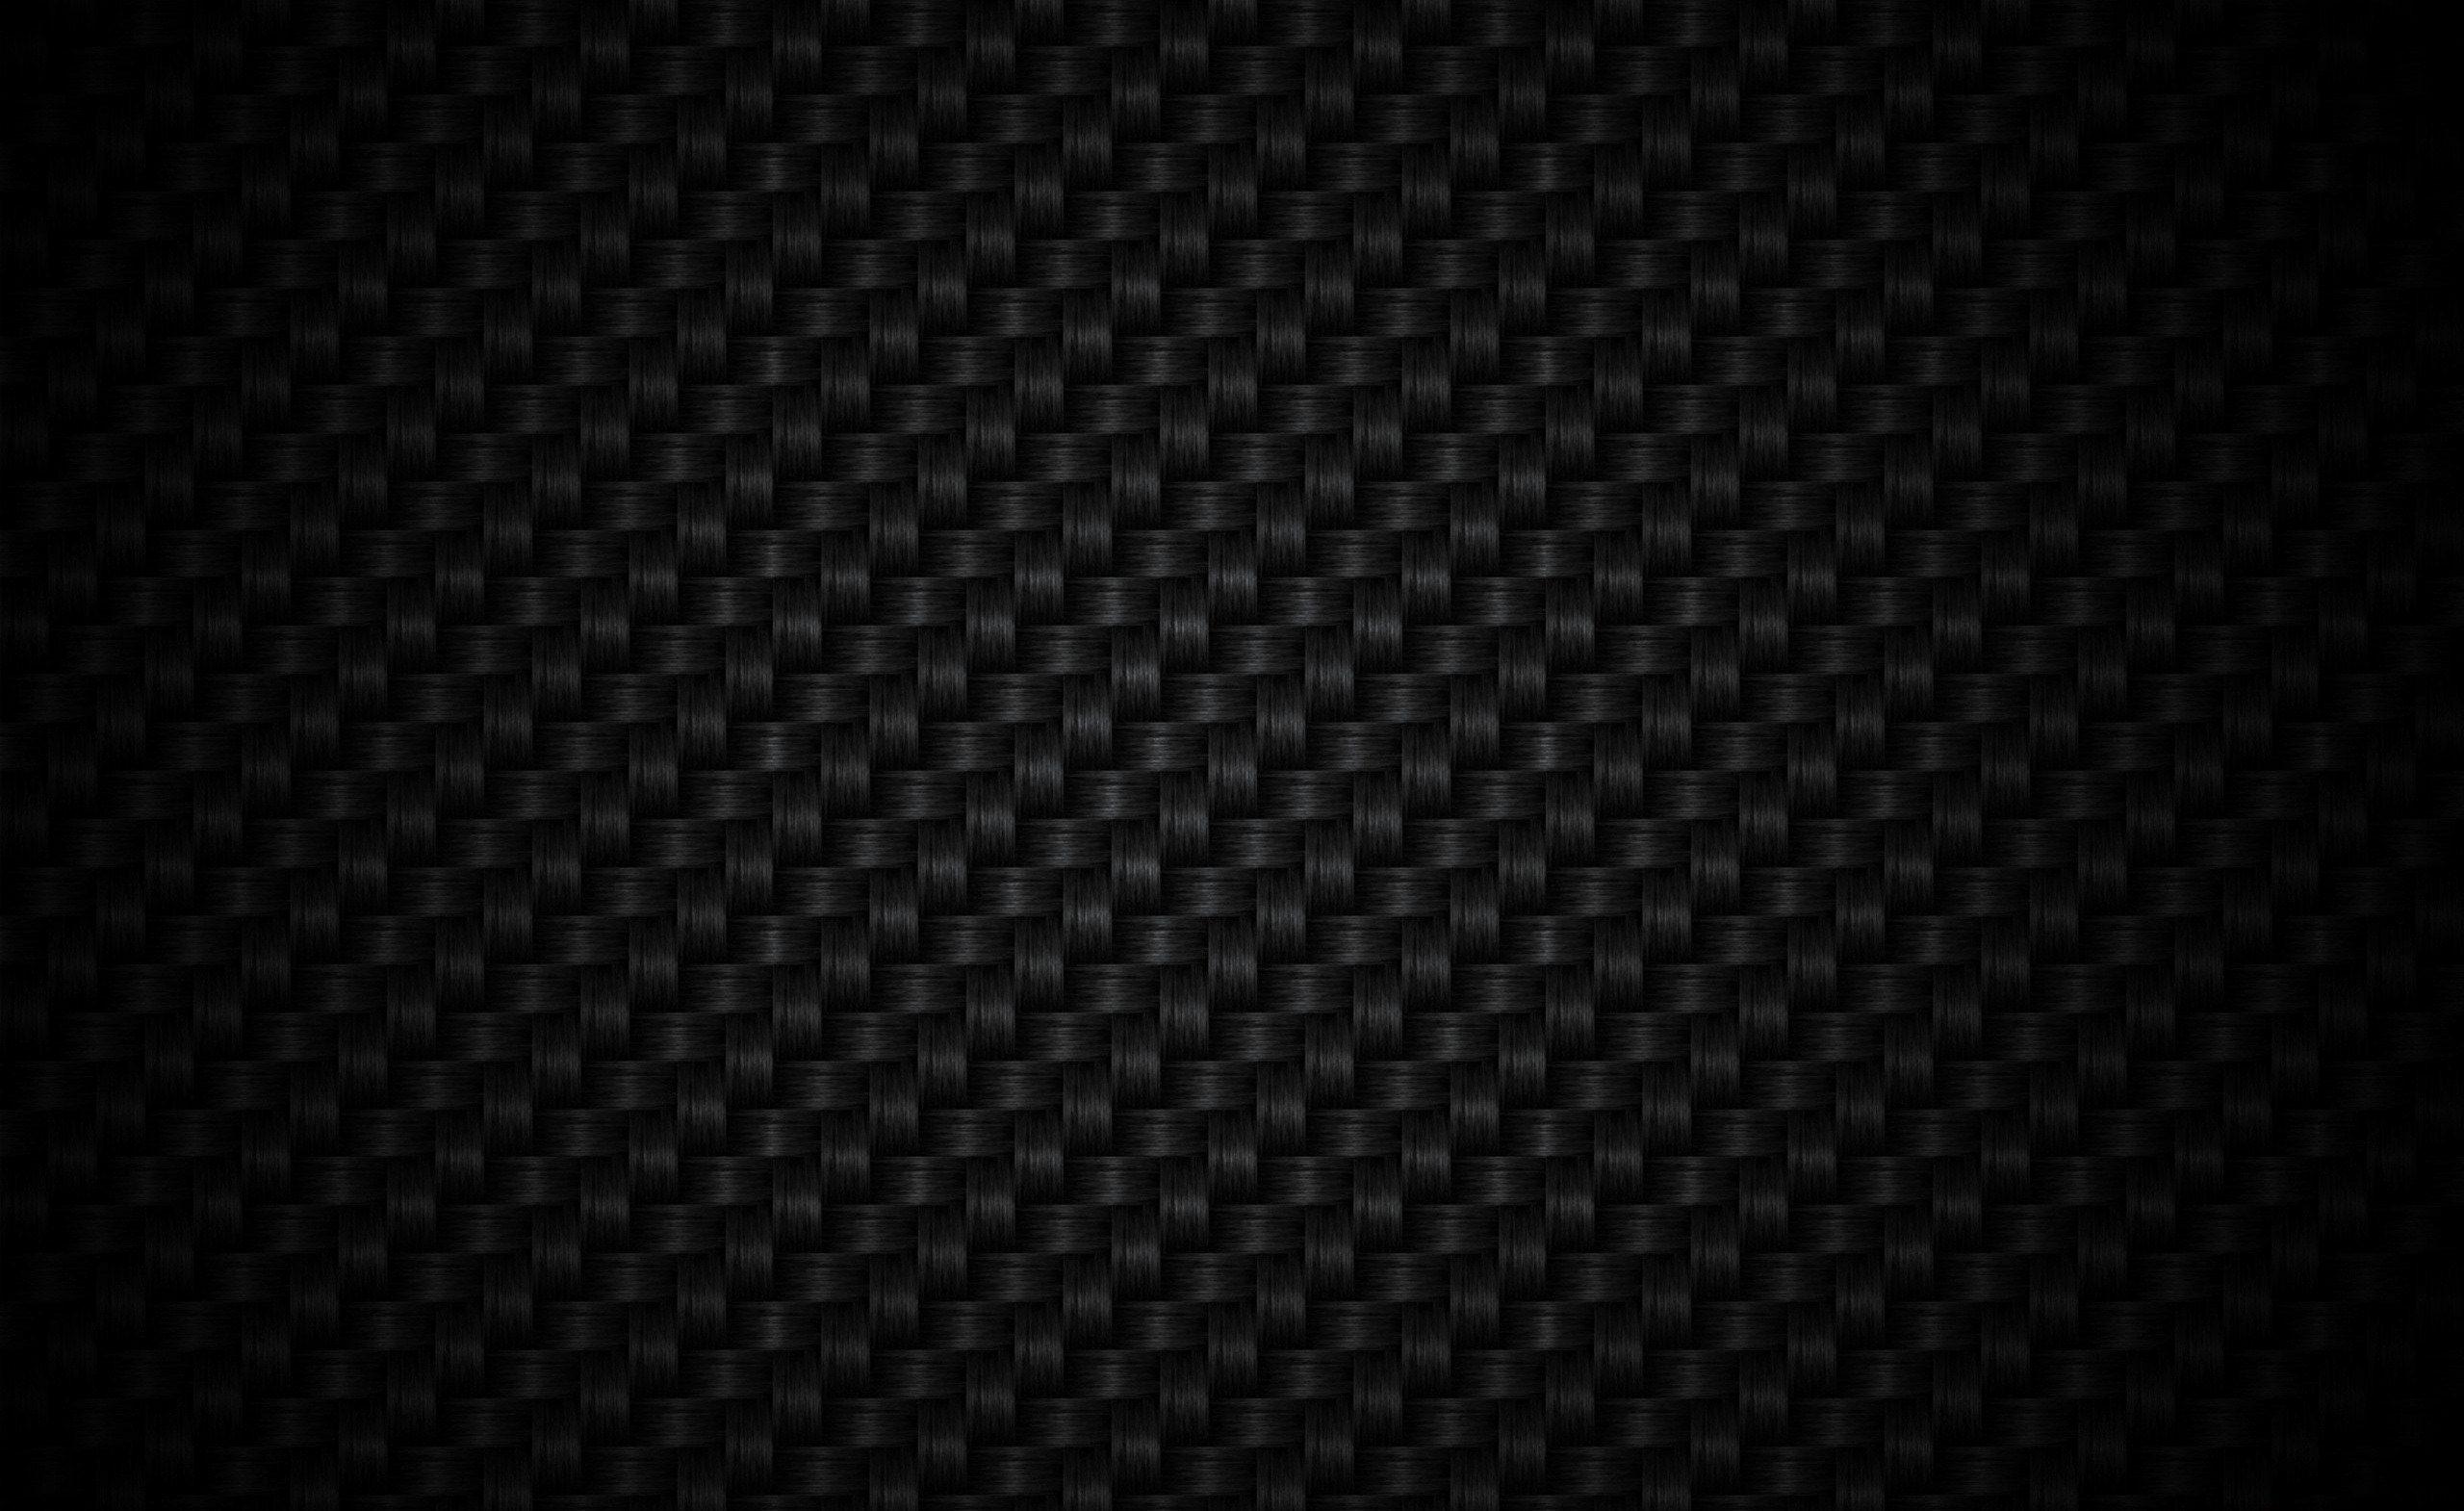 Black Fabric Texture Wallpaper Black leather texture 2560x1570